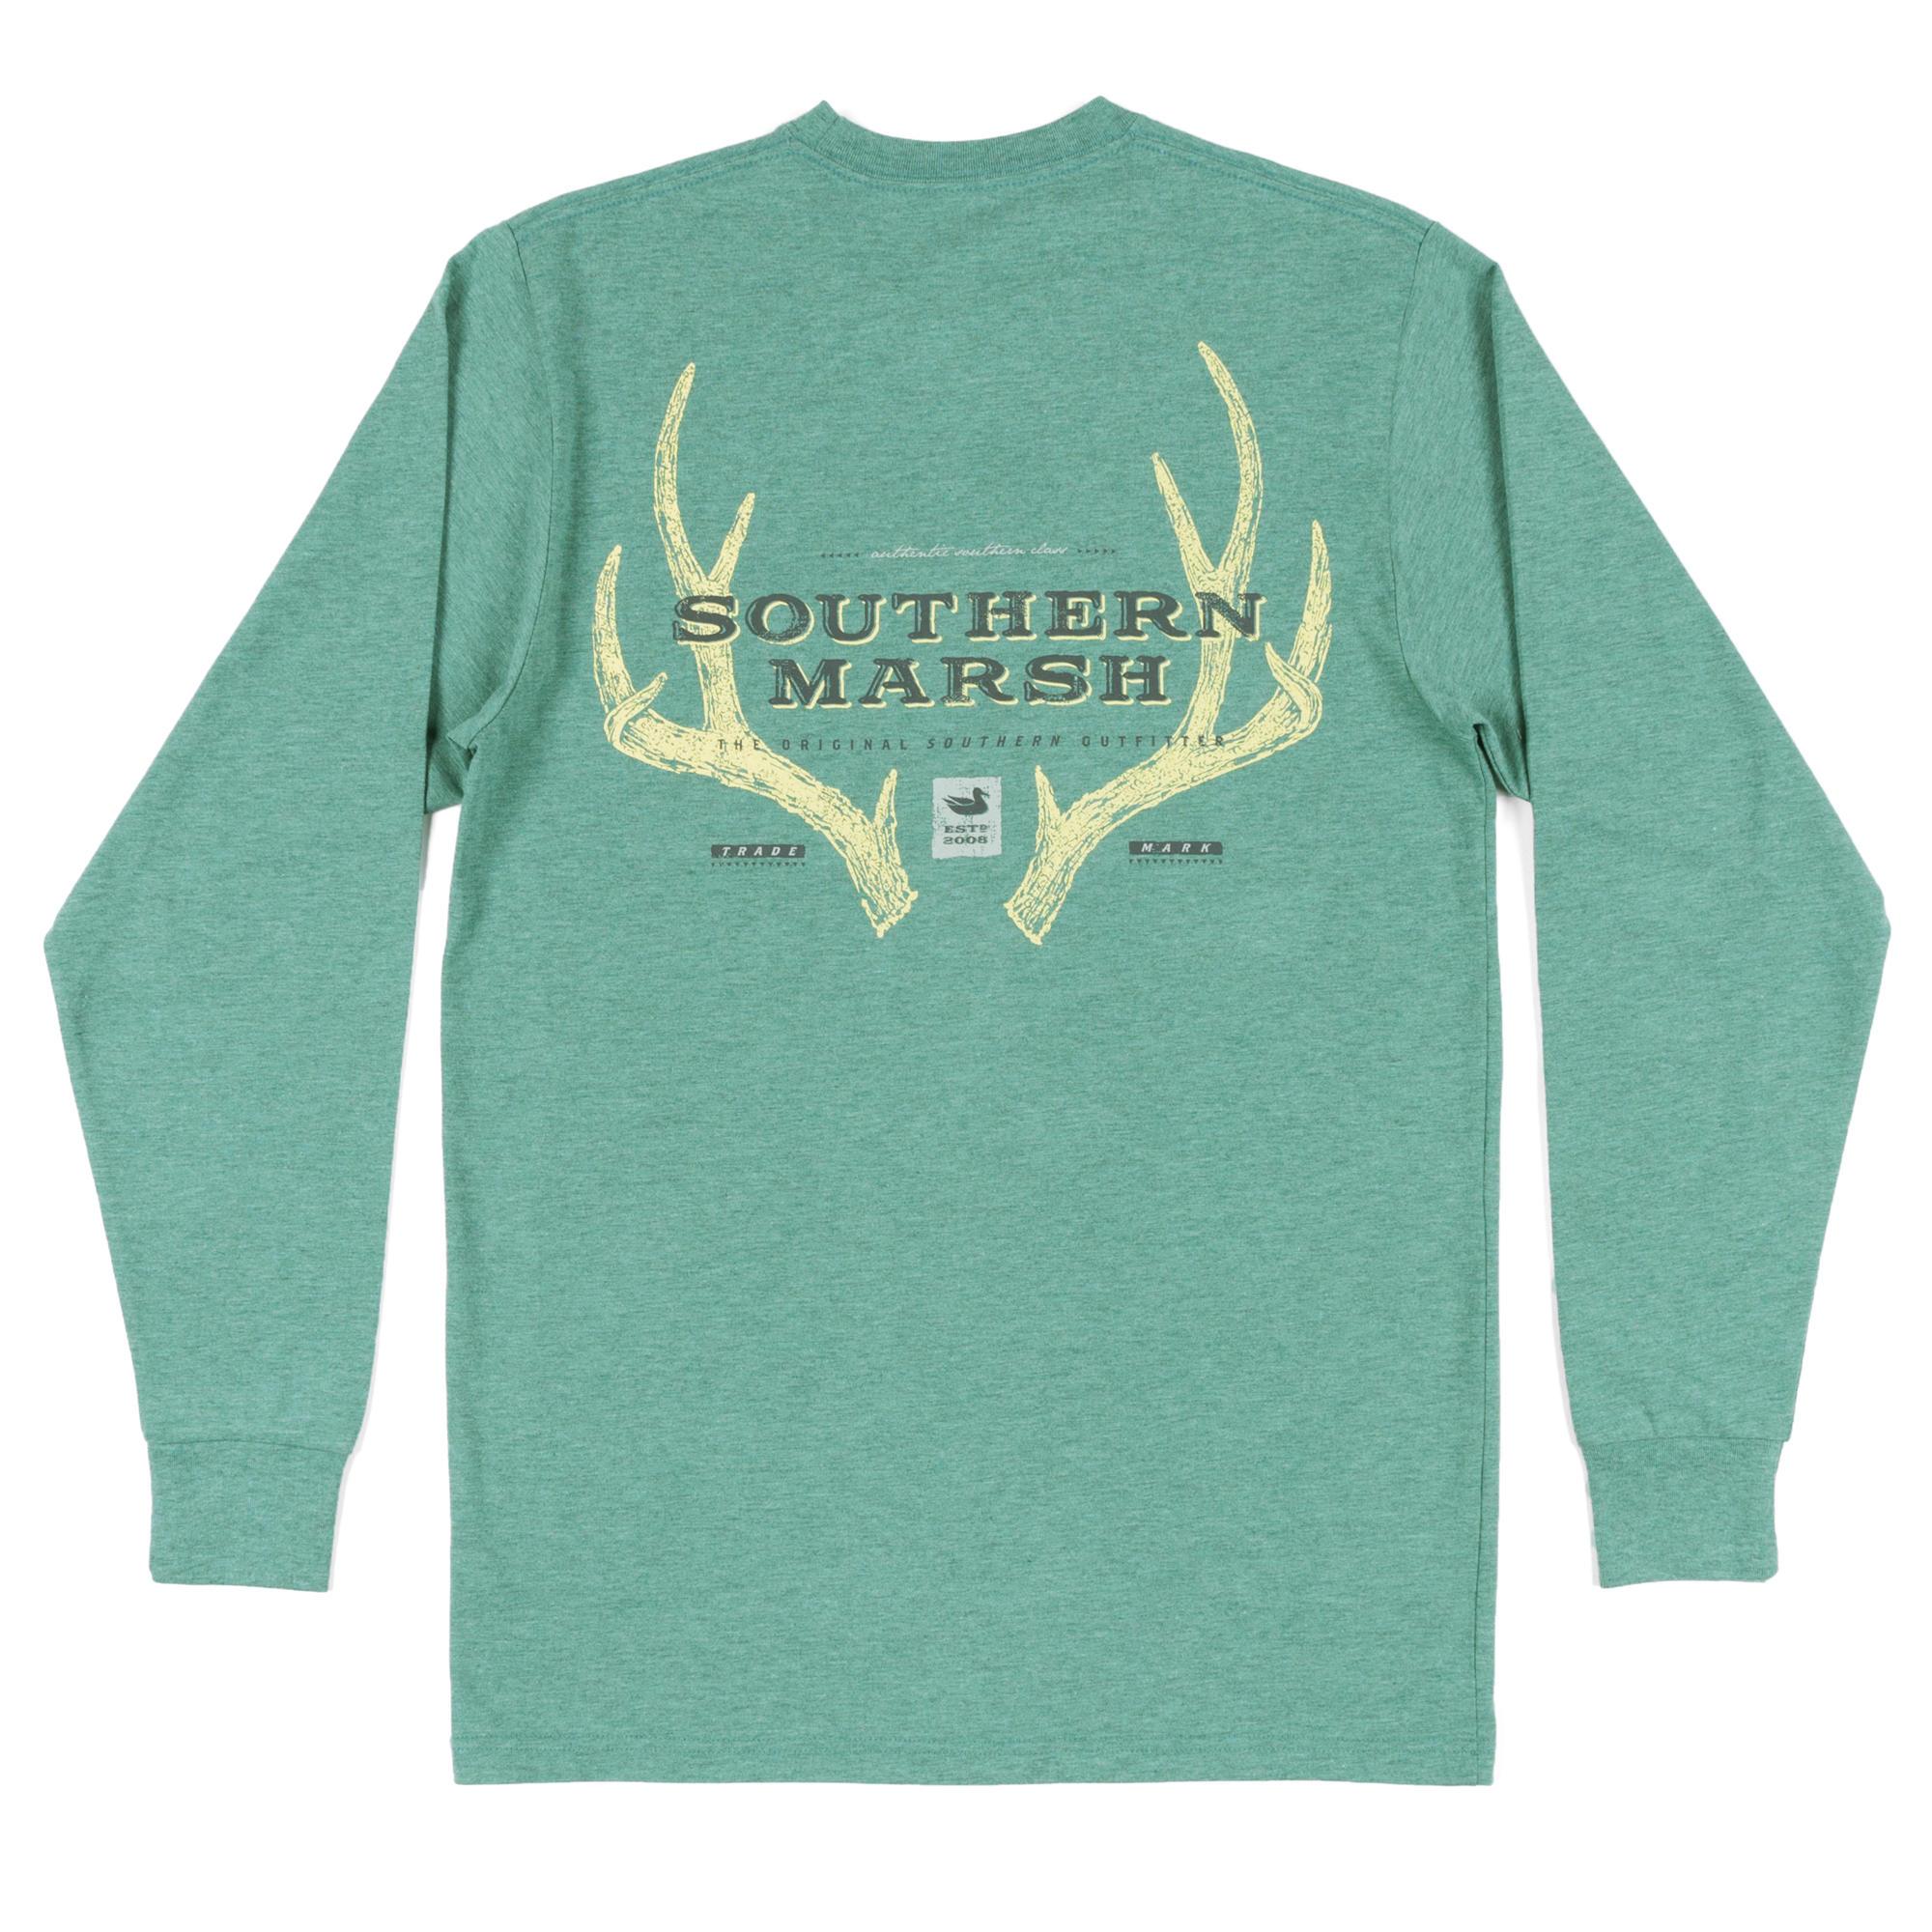 1e3b20d782b Southern Marsh Long Sleeve Origins Rack Shirt (Pick Size Color)